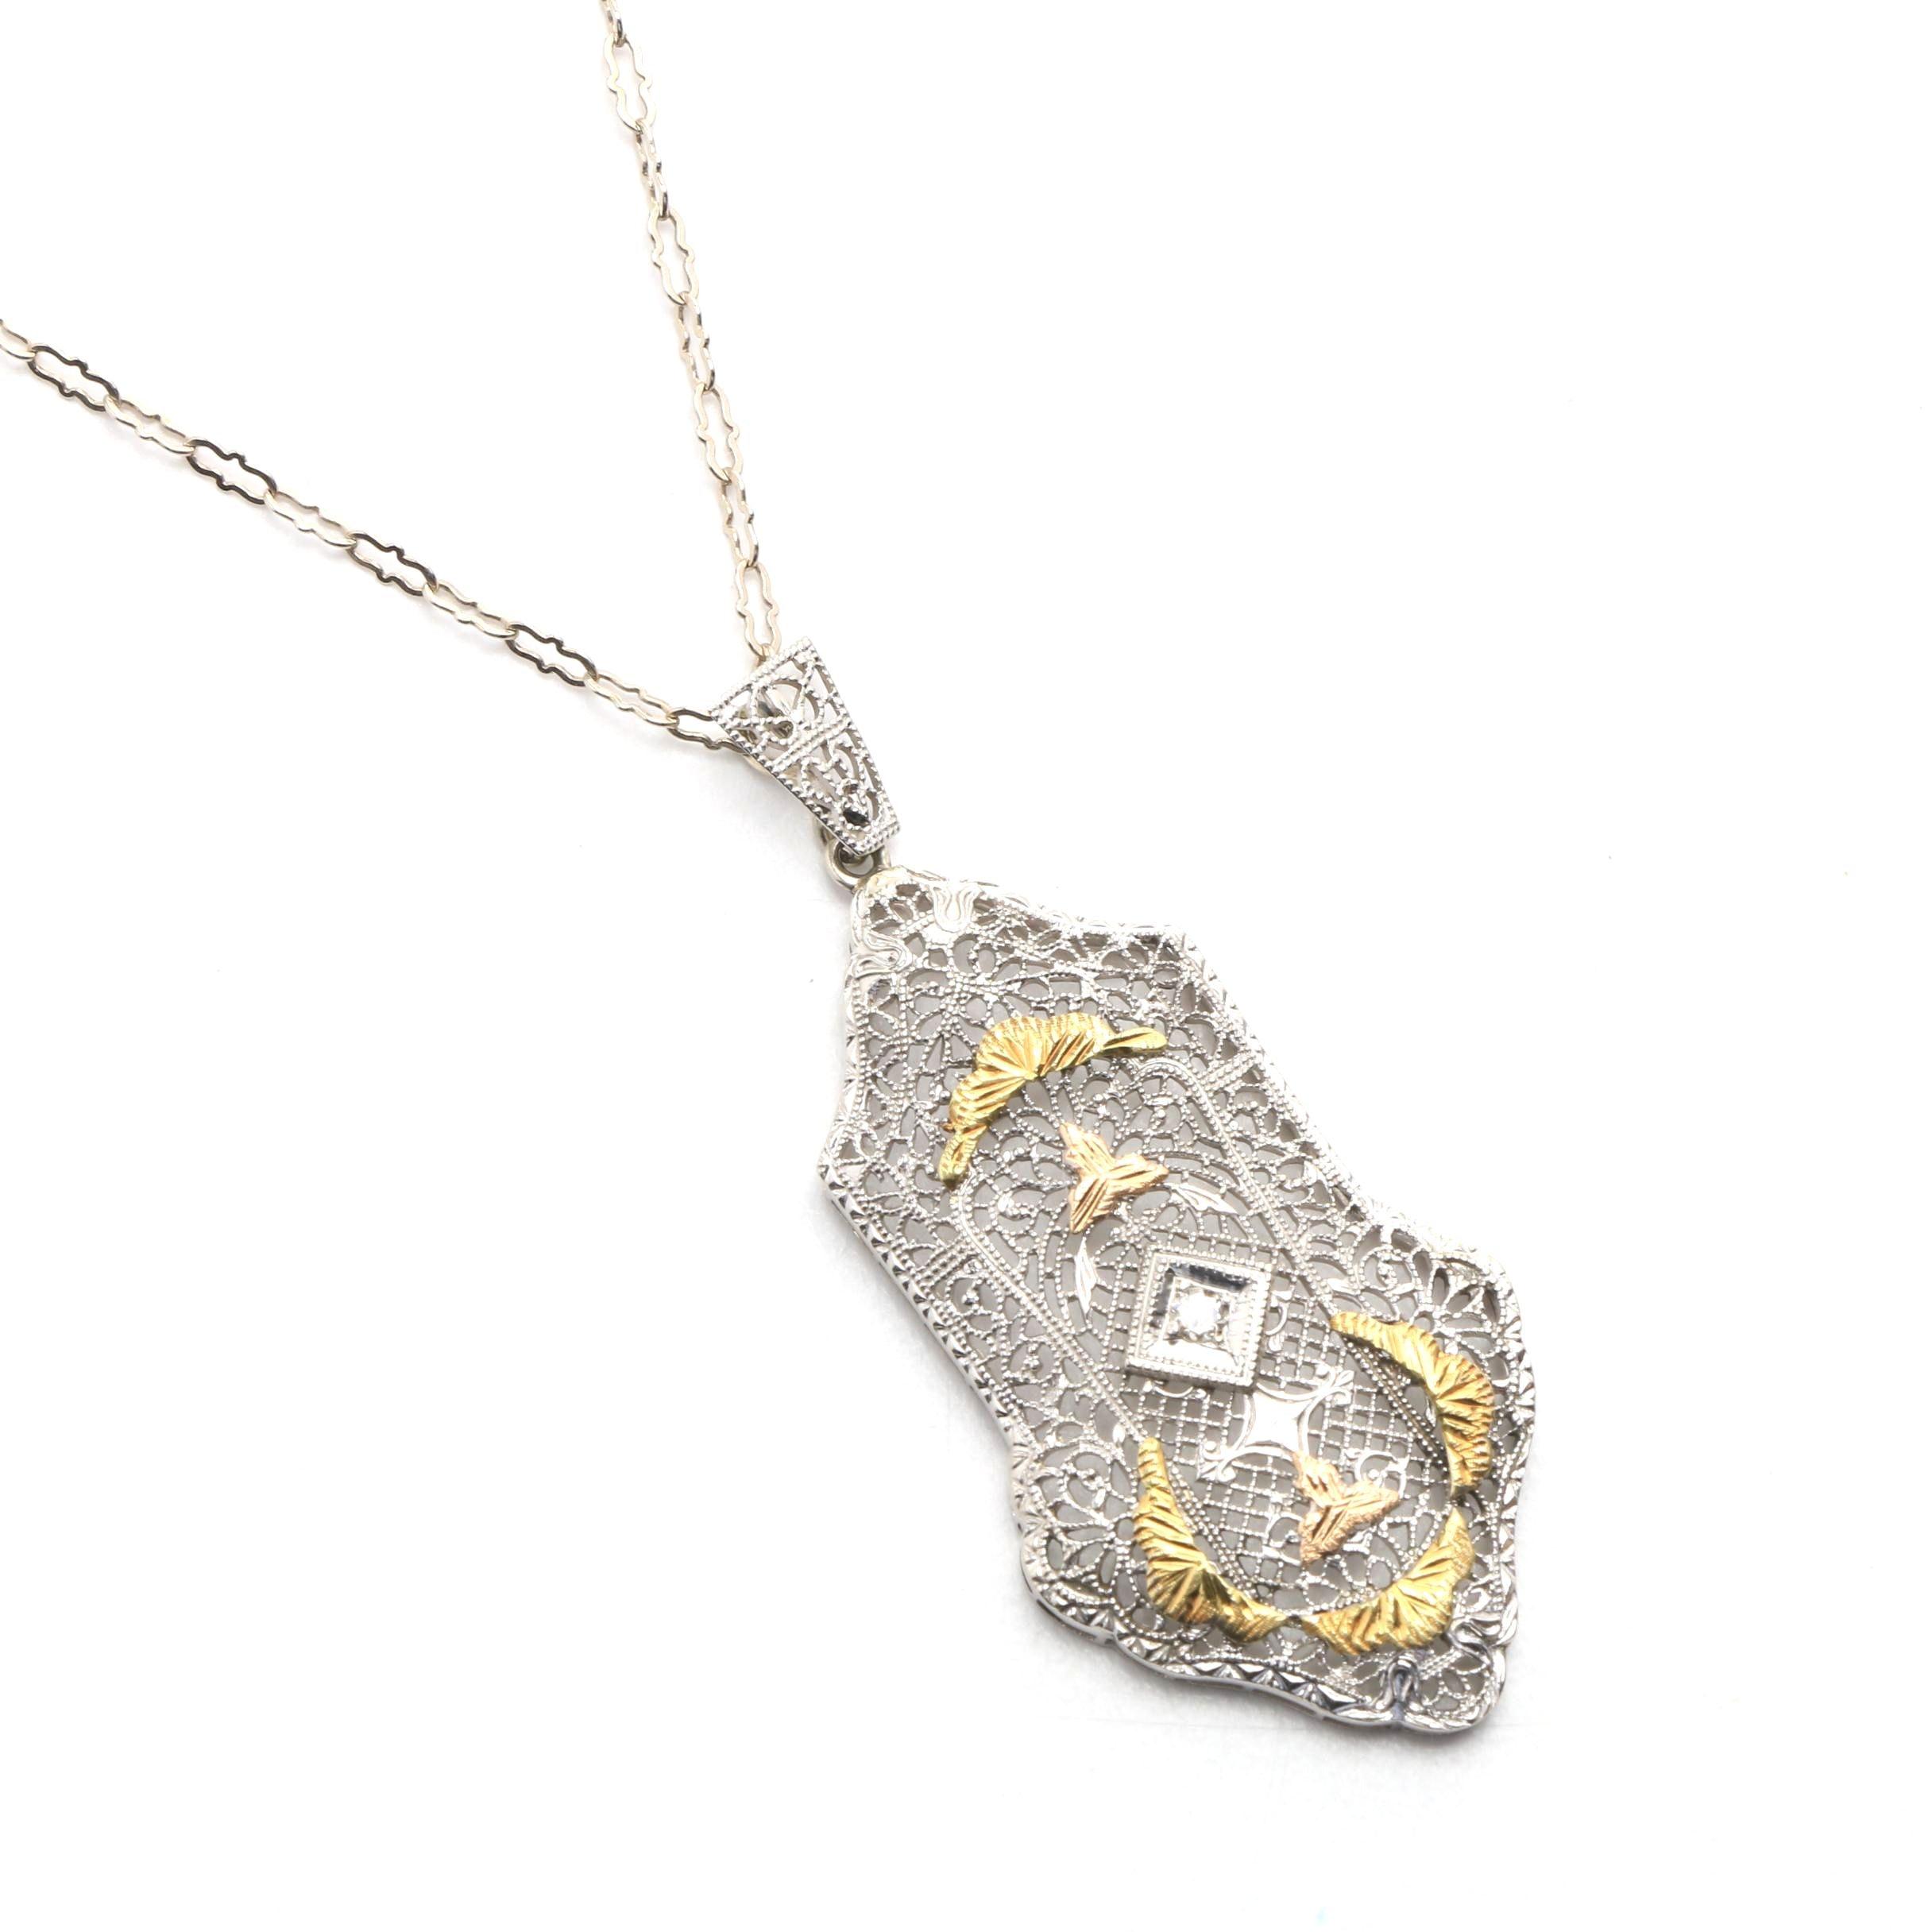 Edwardian Revival 14K White Gold Filigree Pendant Necklace with Diamond